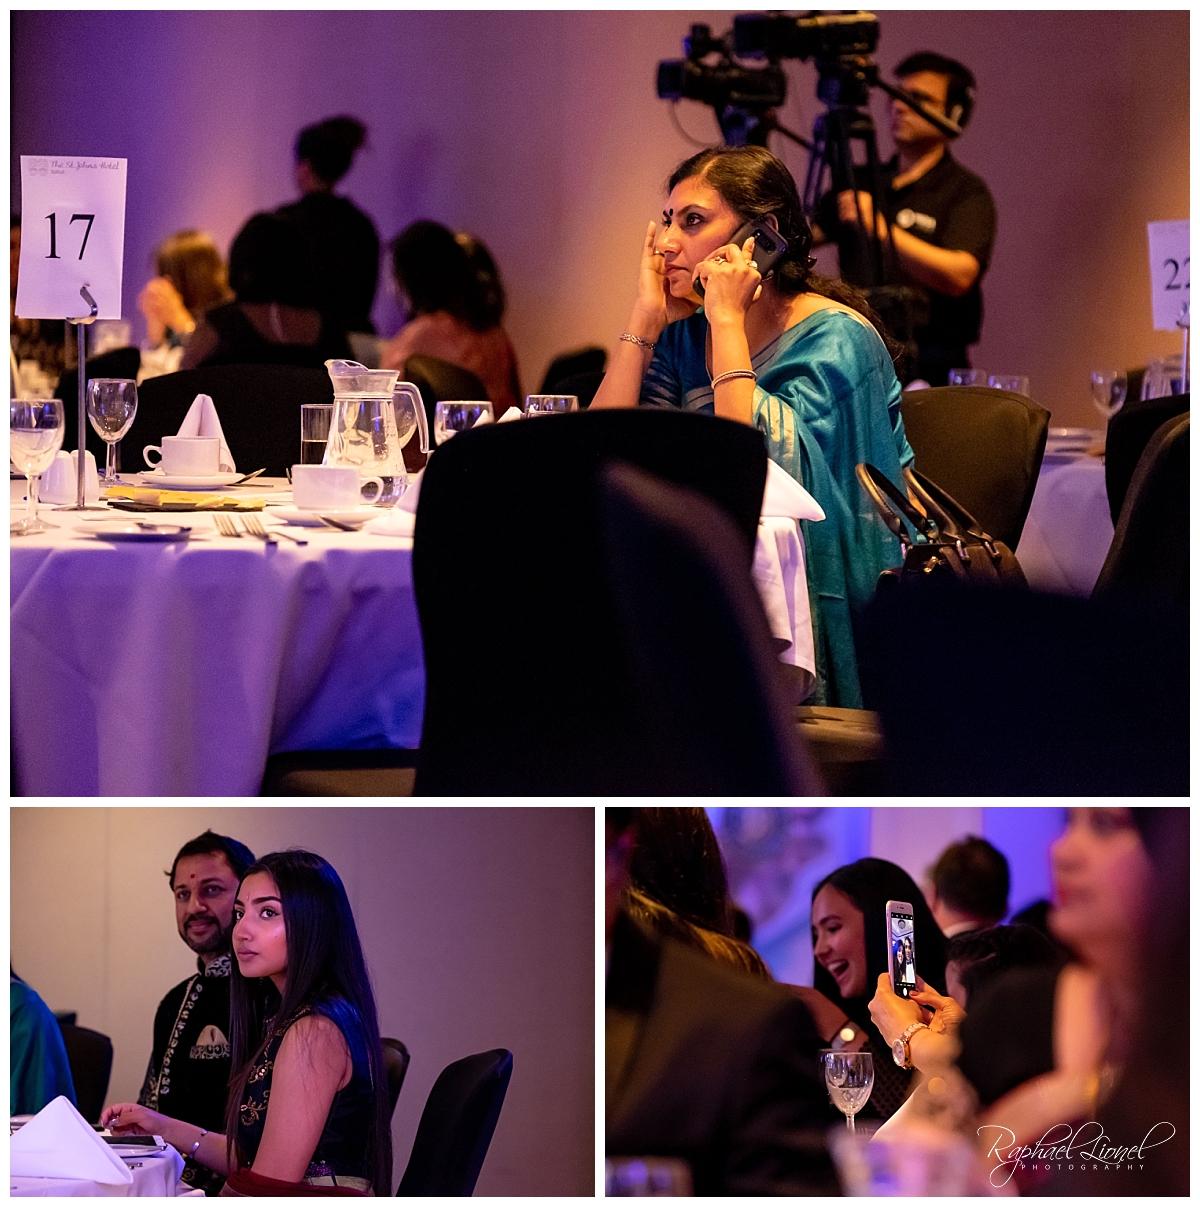 British Indian Awards 2018 6 - British Indian Awards 2018 St Johns Hotel